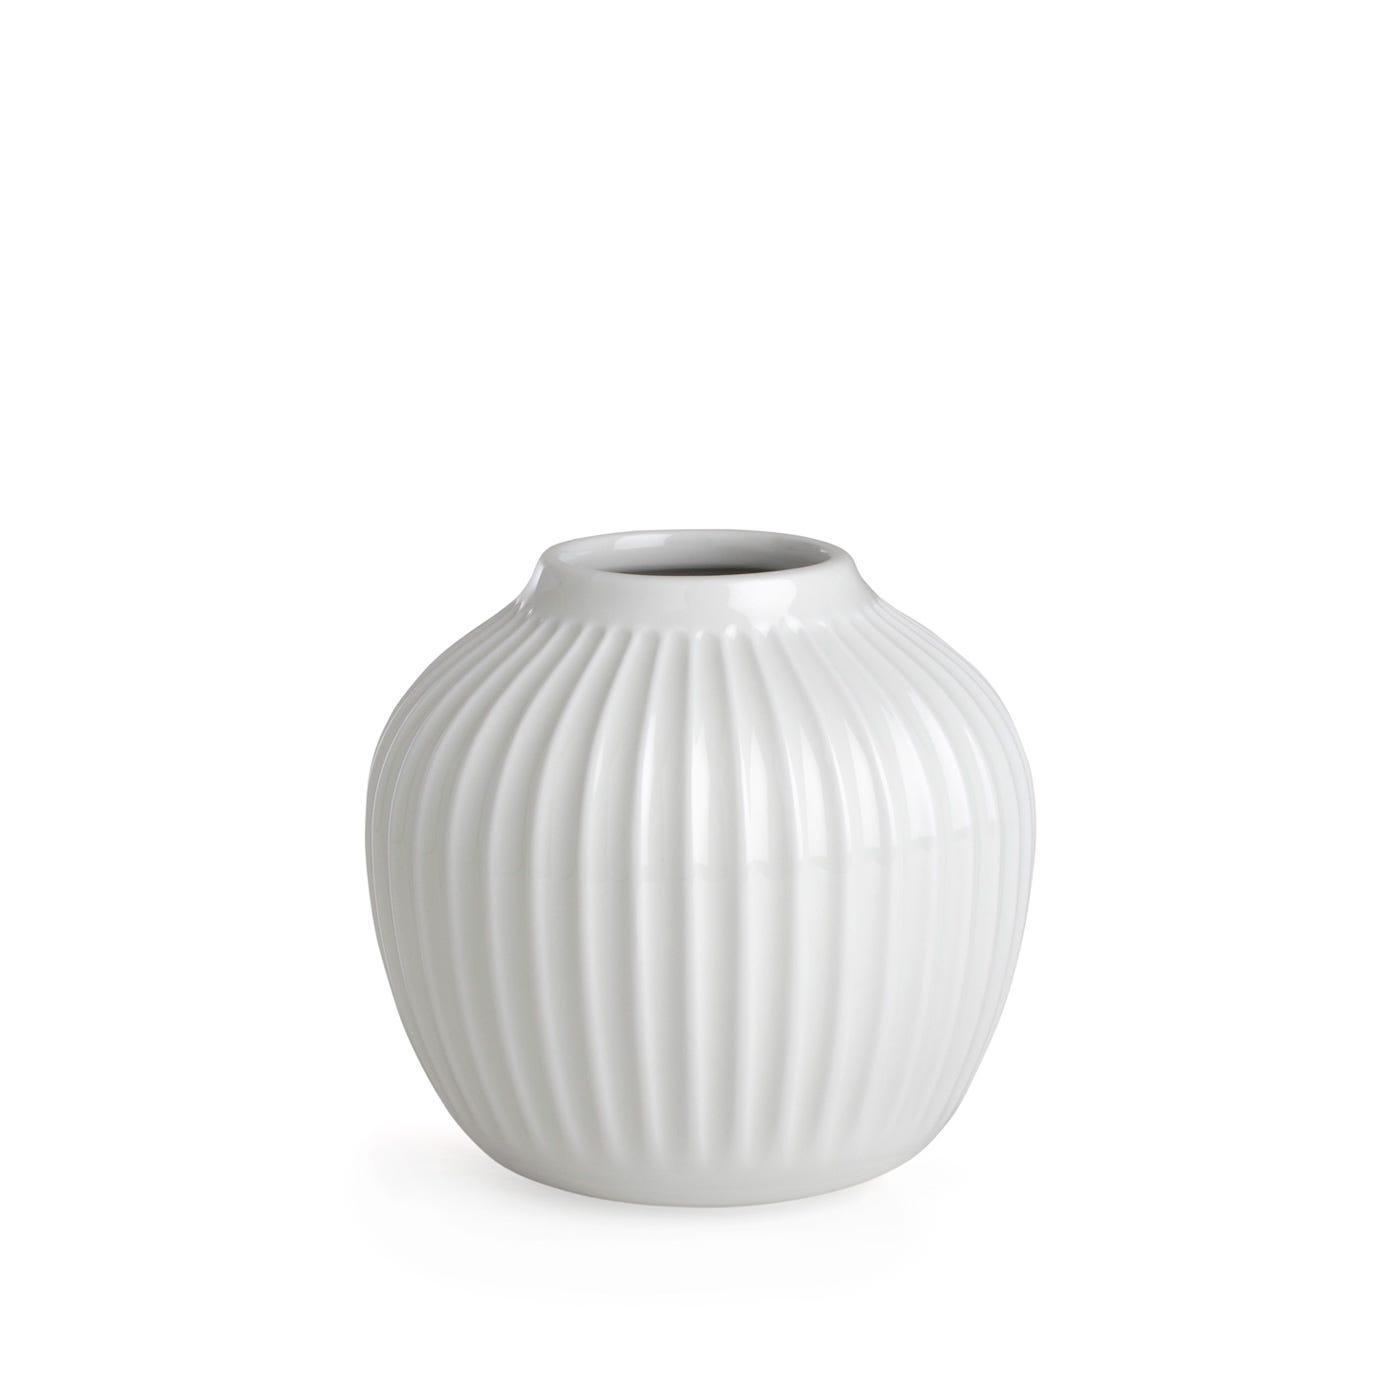 Hammershoi Ridged Vase Small White